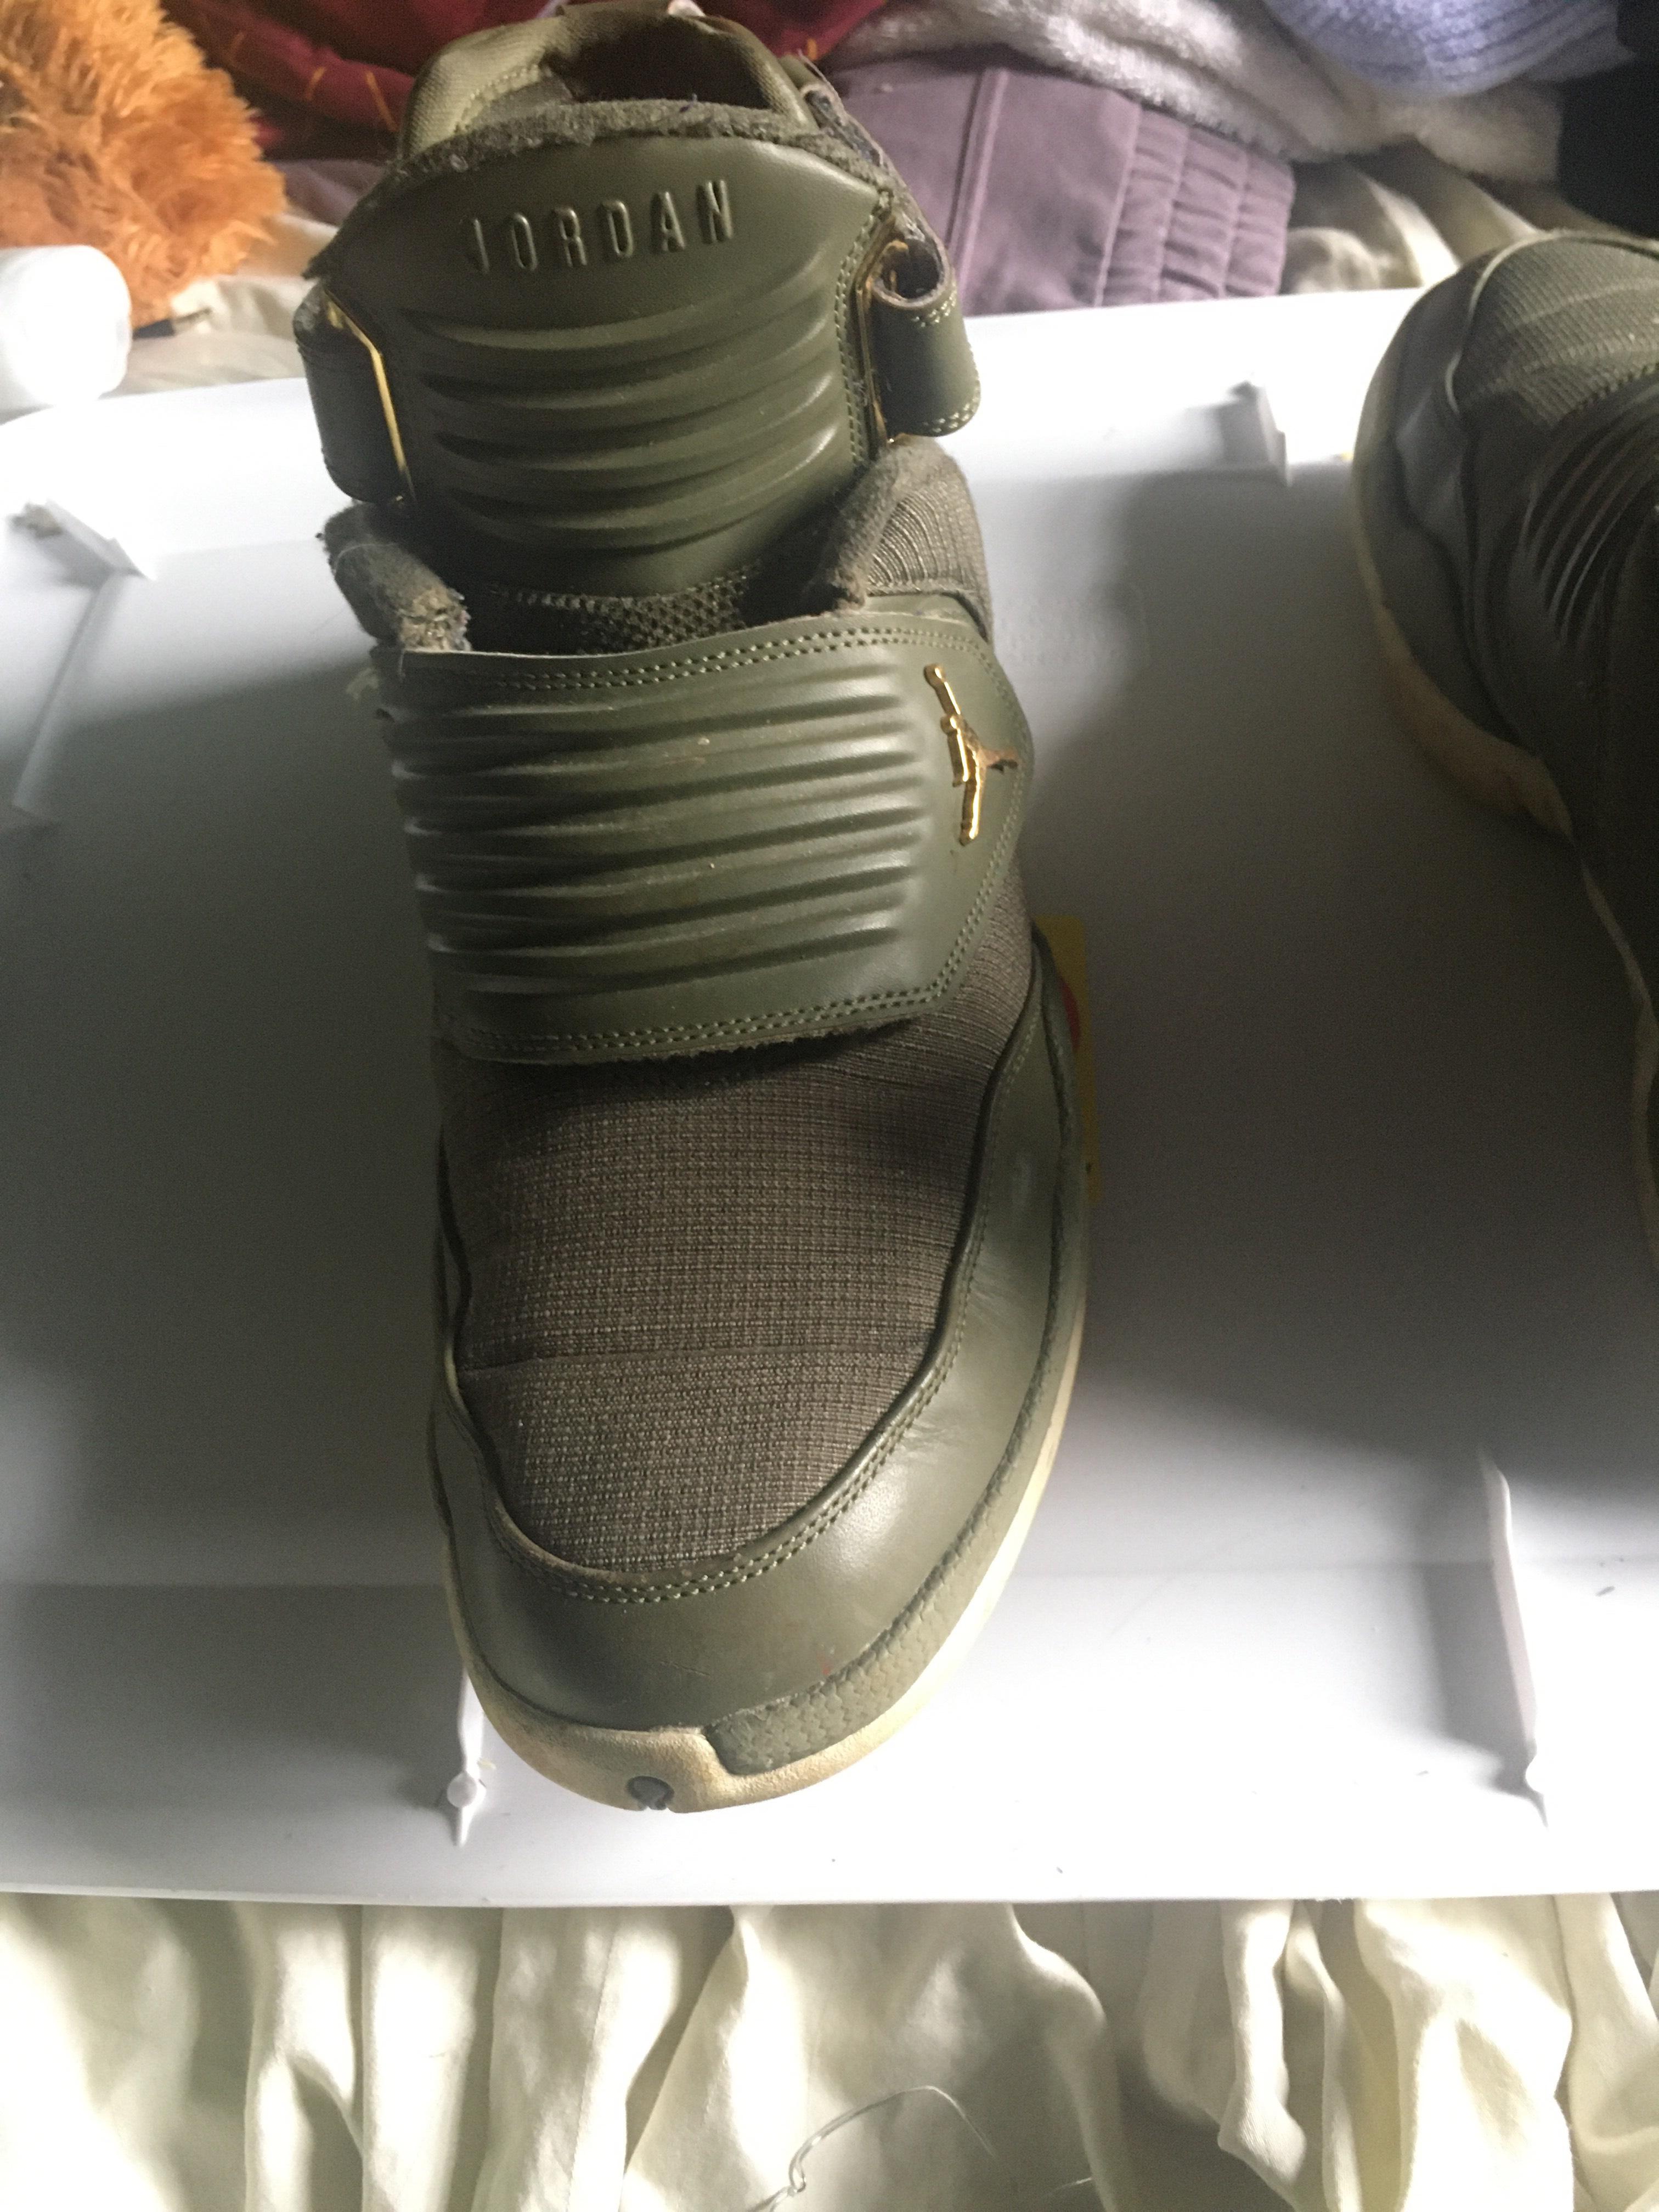 Air Jordan - $129 - Size 11